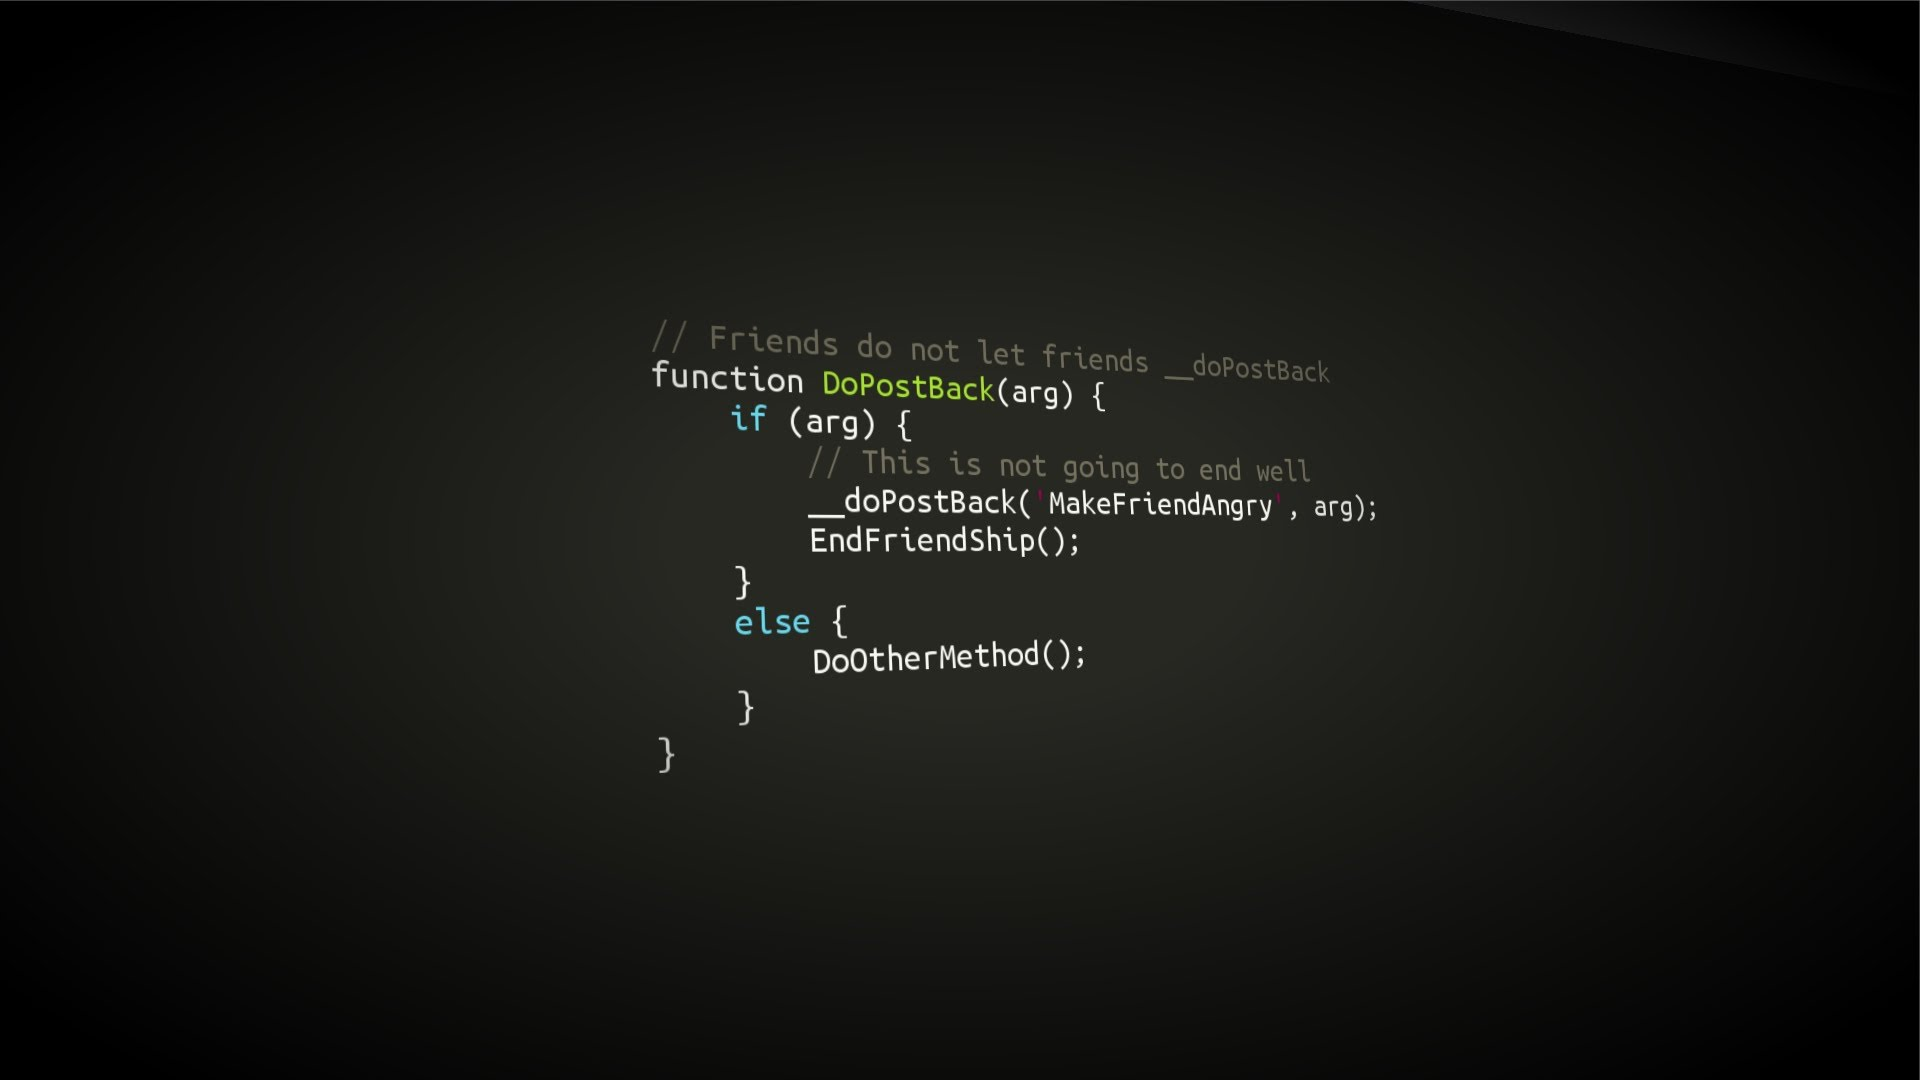 Premire Utilisation De Microsoft Visual Studio 2010 C 1920x1080